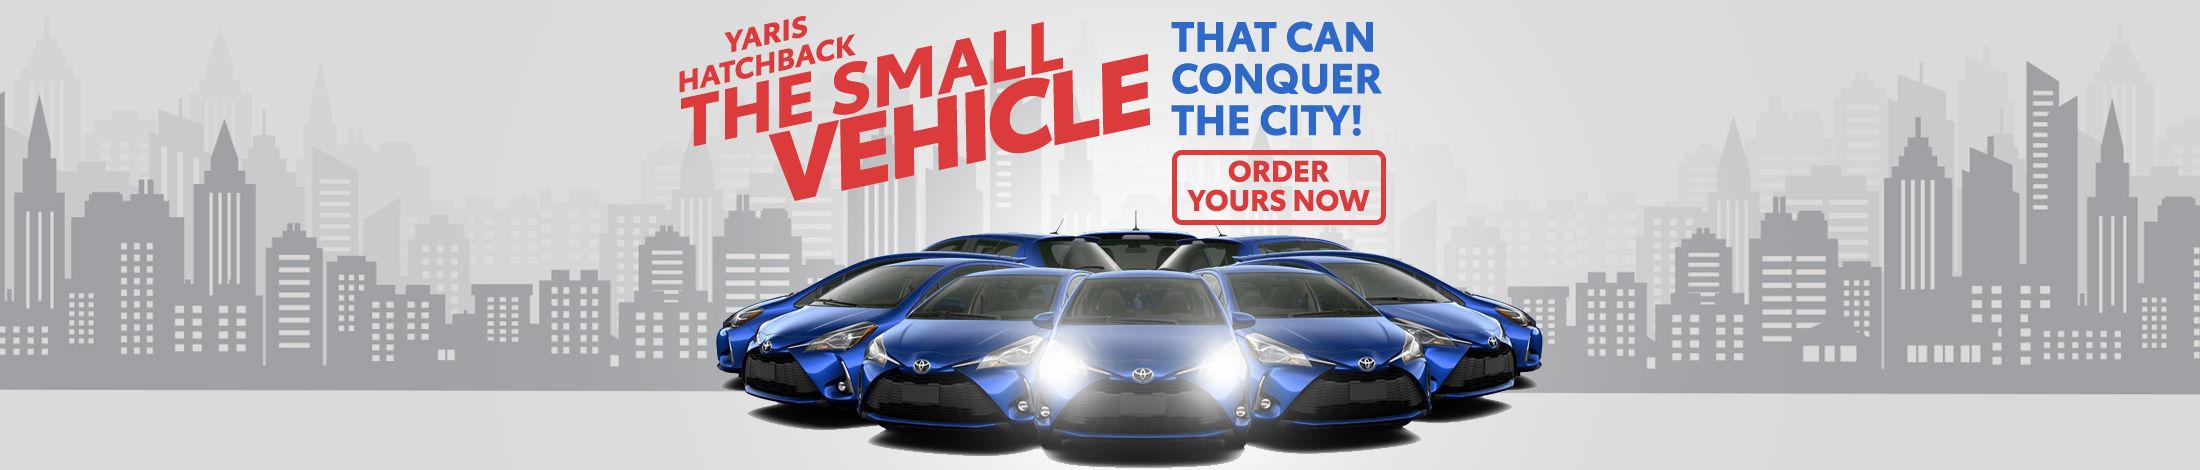 yaris hatchback Toyota